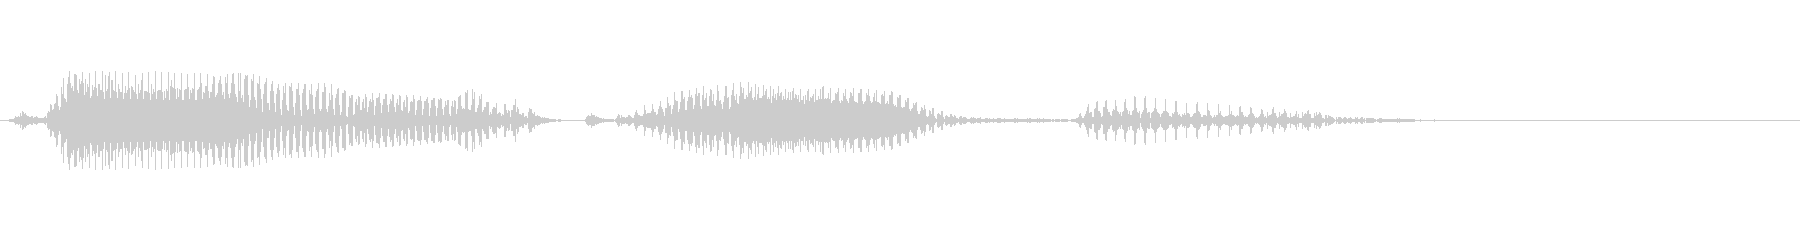 GameOverの未再生の波形